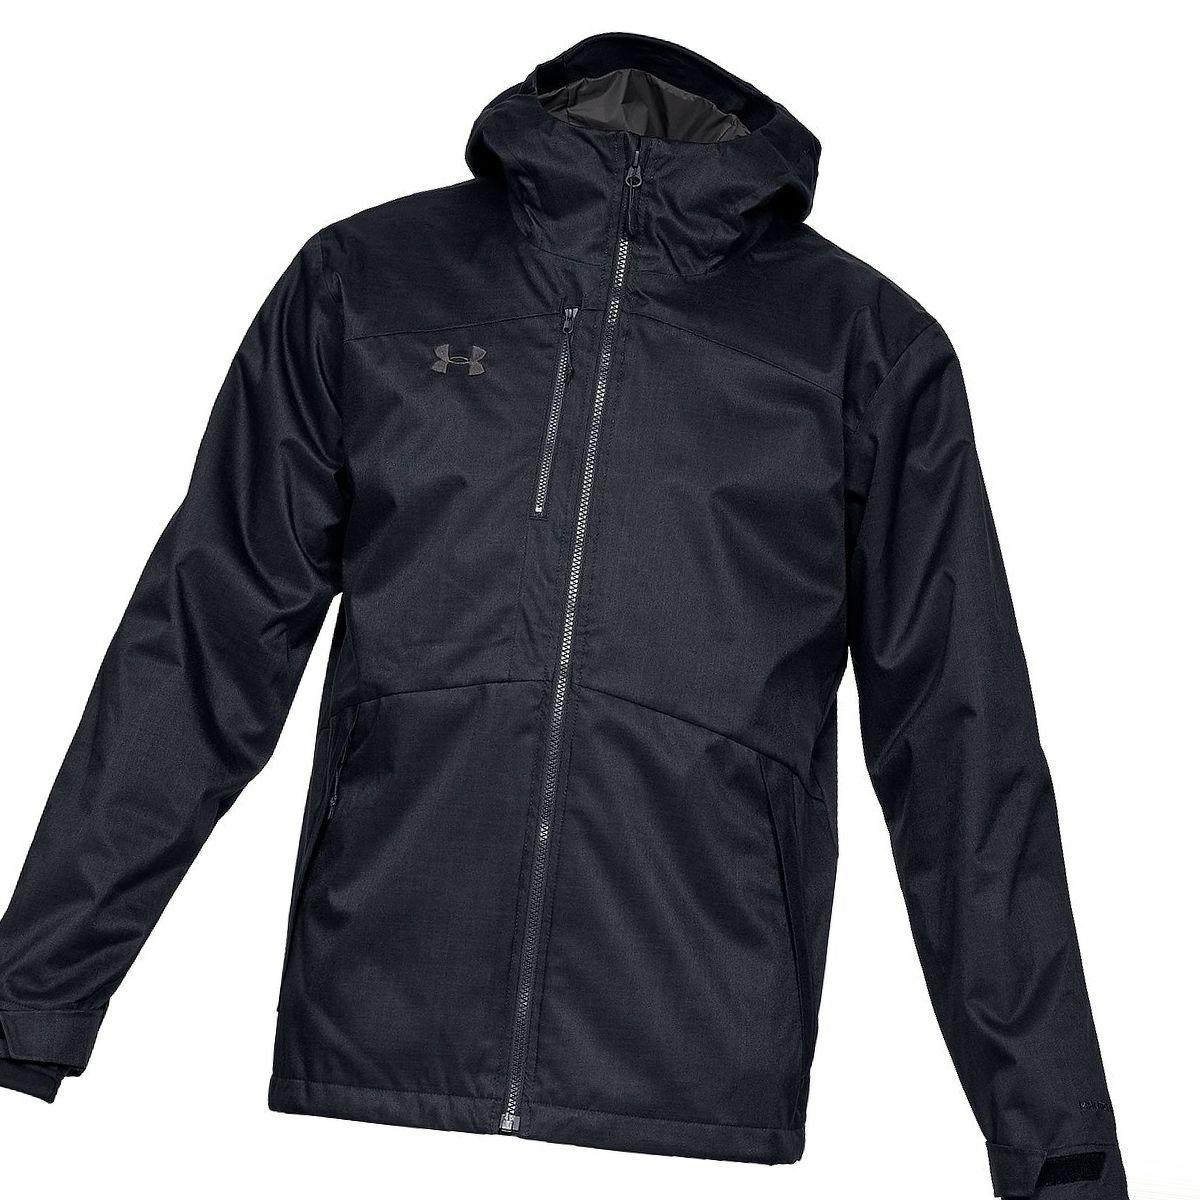 Under Armour Porter 3-in-1 Jacket - Men's